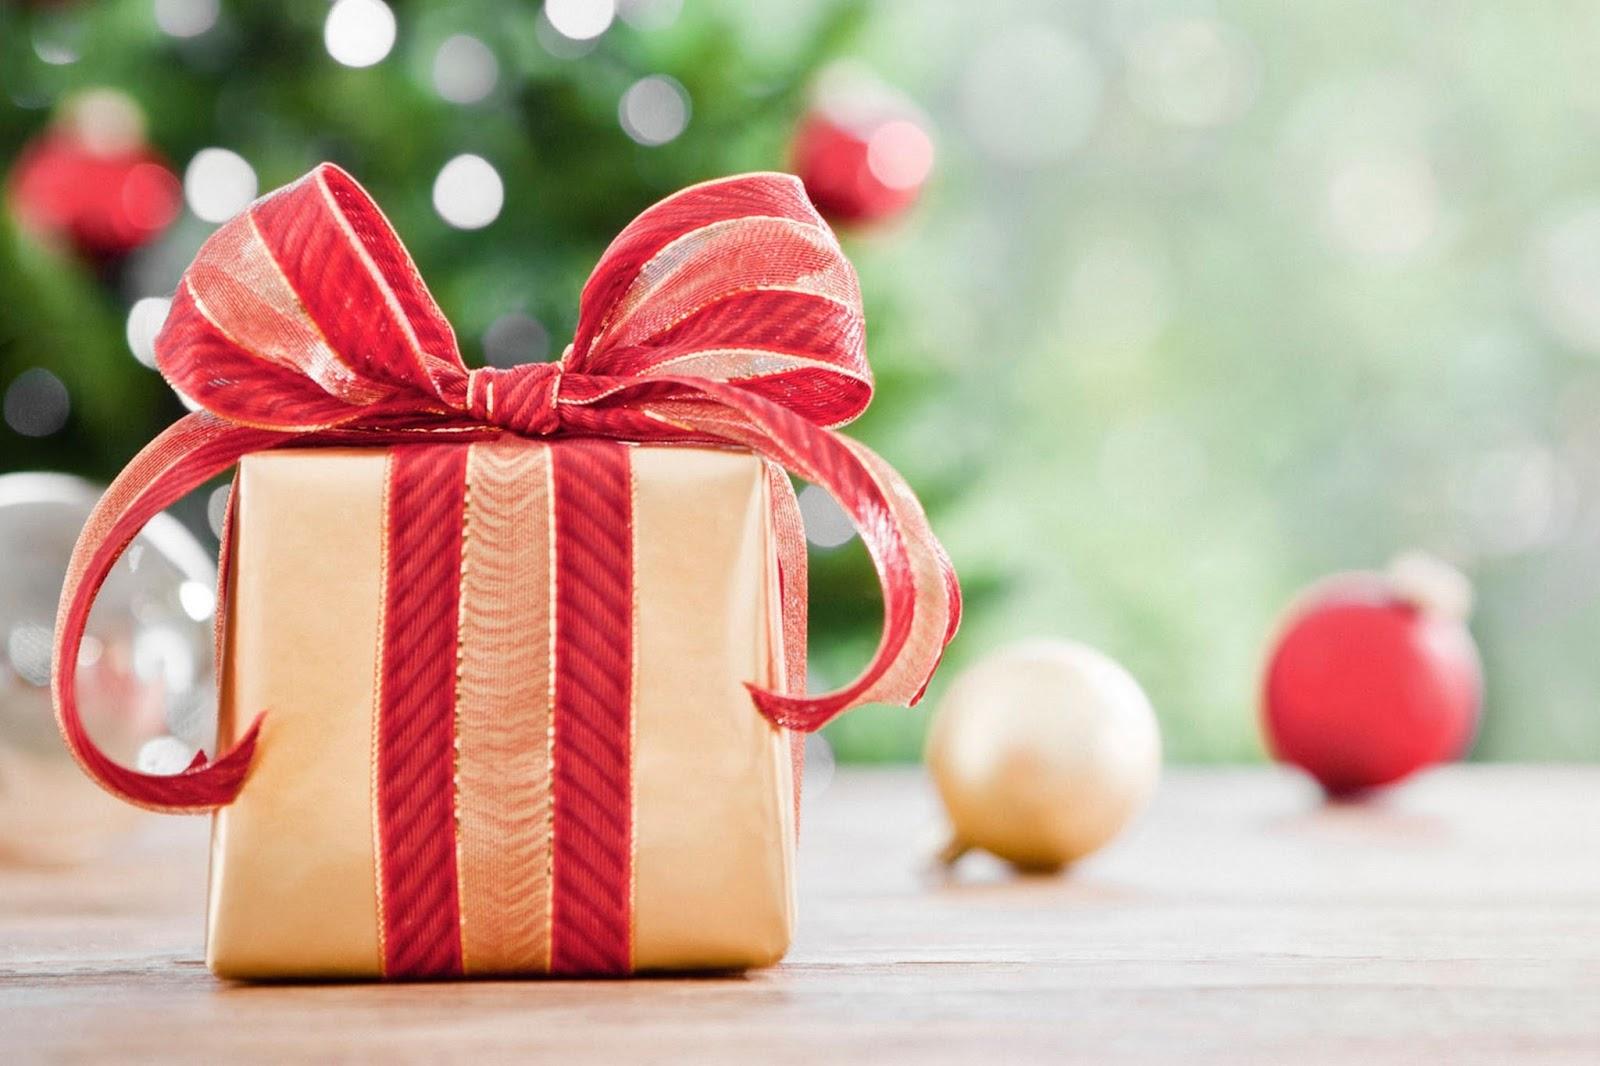 idée cadeau, cadeaux folies, noël